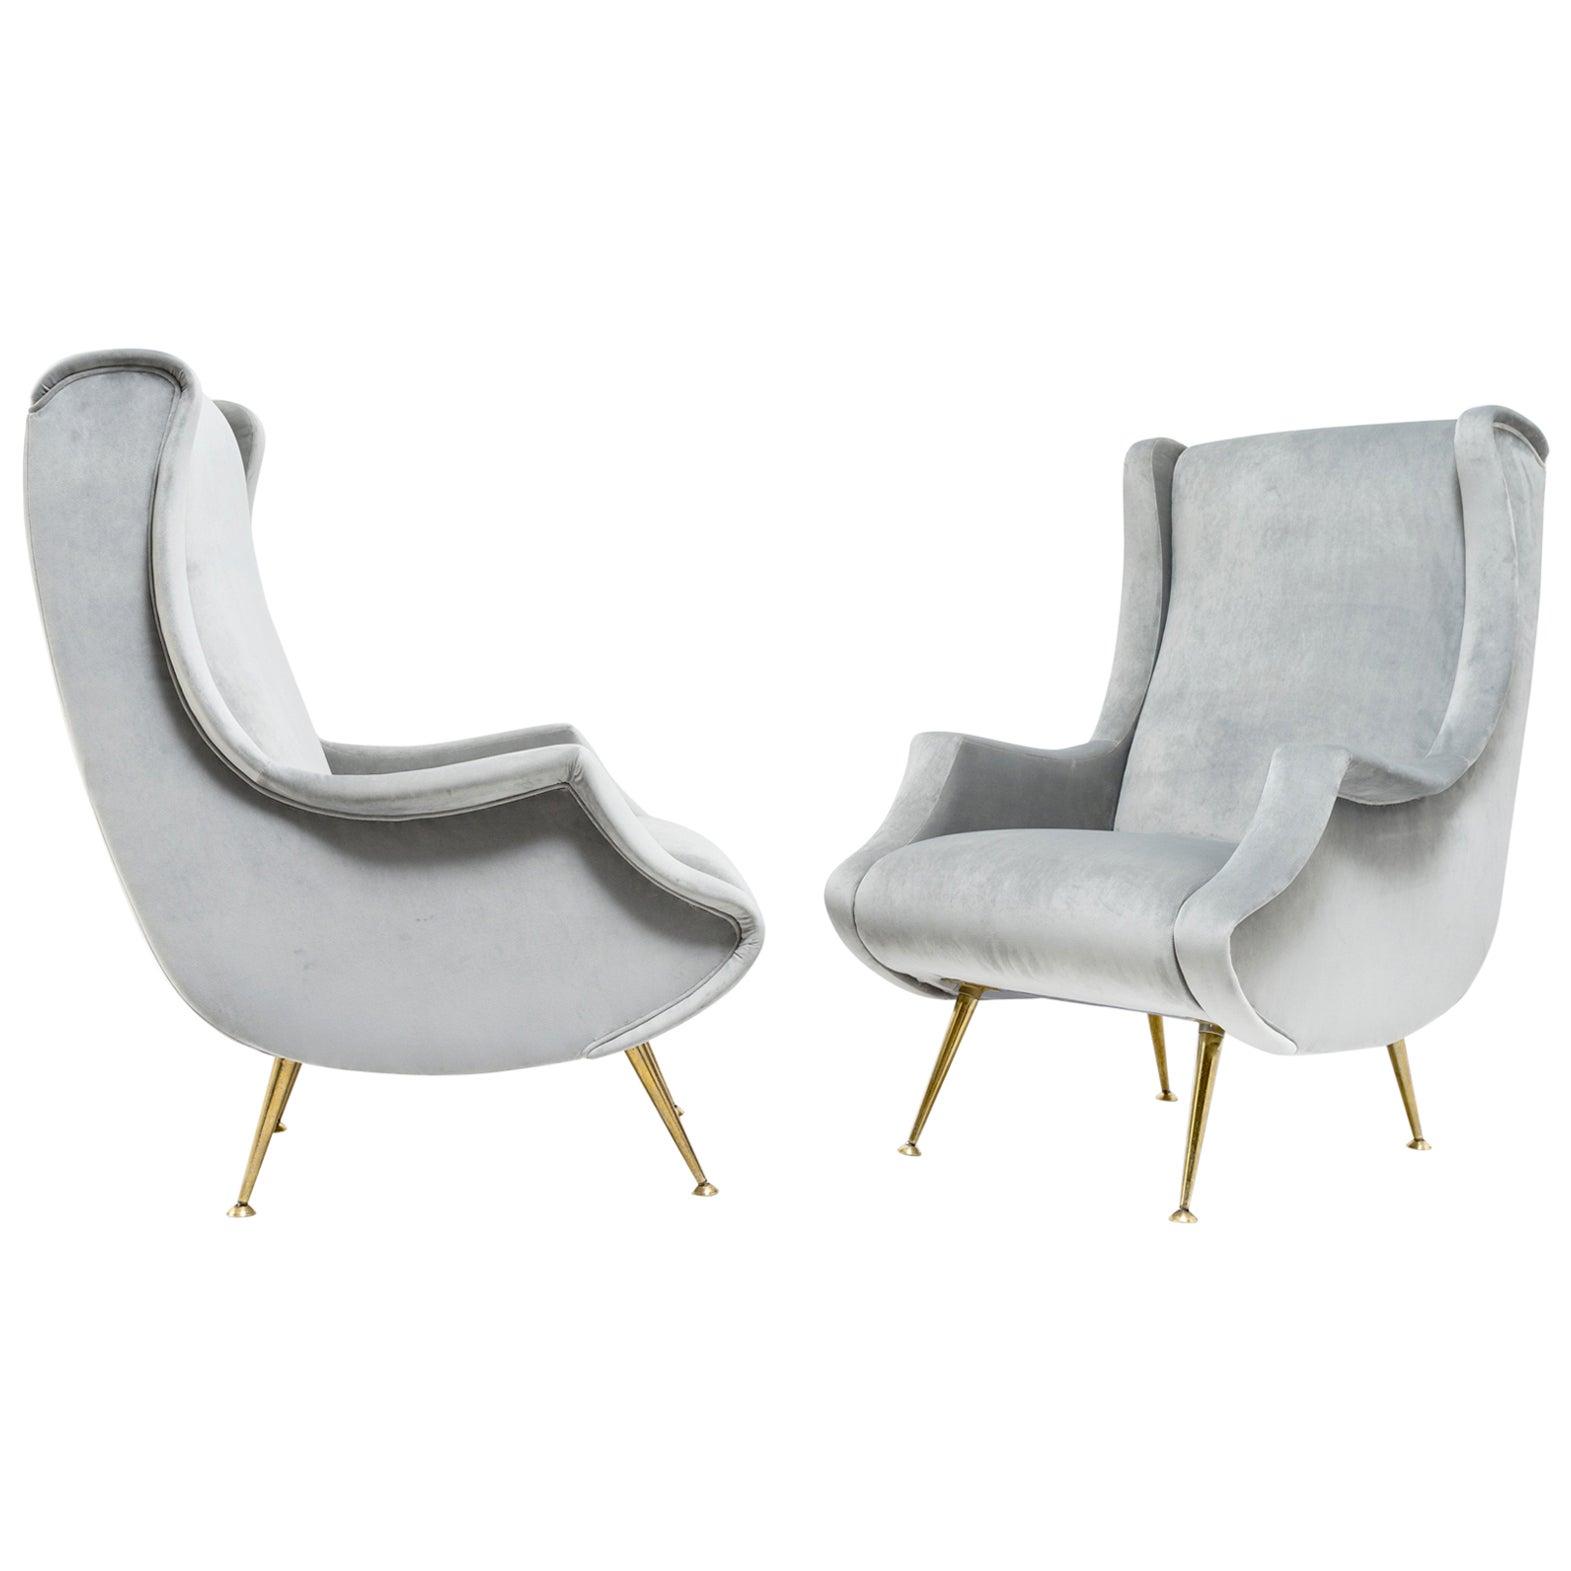 Pair of armchairs by ISA Bergamo - Italy, 1950s